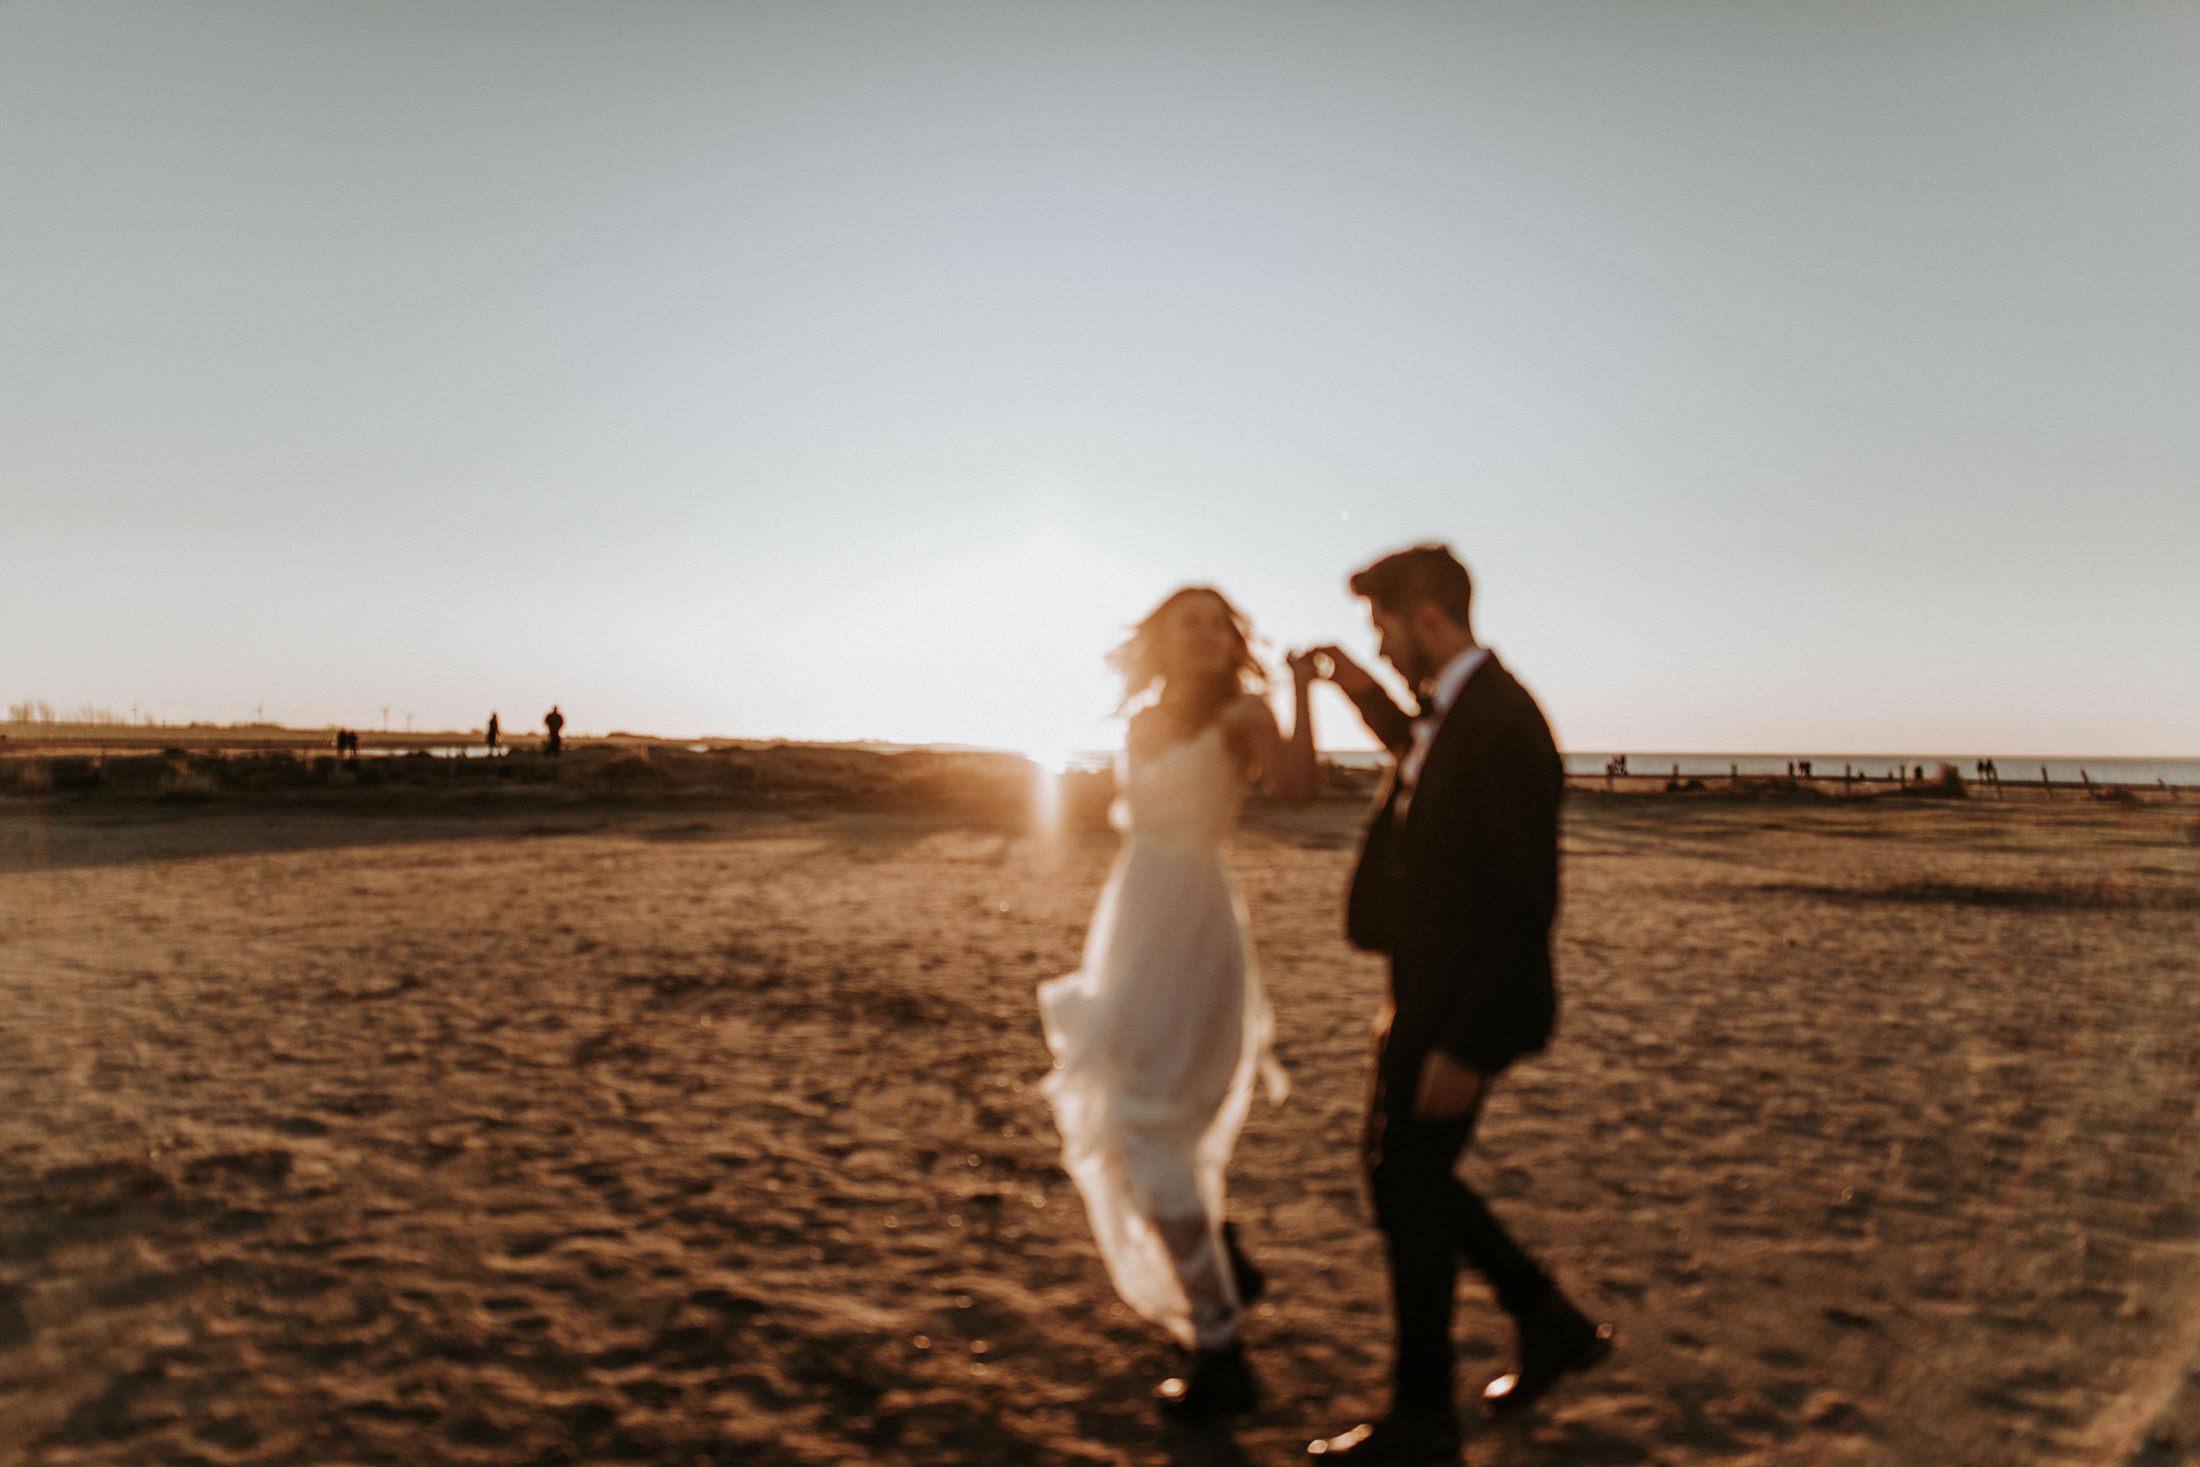 Wedding_Photographer_Mallorca_Daniela-Marquardt_Photography_CanaryIslands_Lanzarote_Iceland_Tuskany_Santorini_Portugal_Schweiz_Austria_Bayern_Elopement_Hochzeitsfotograf_Norddeichich_60